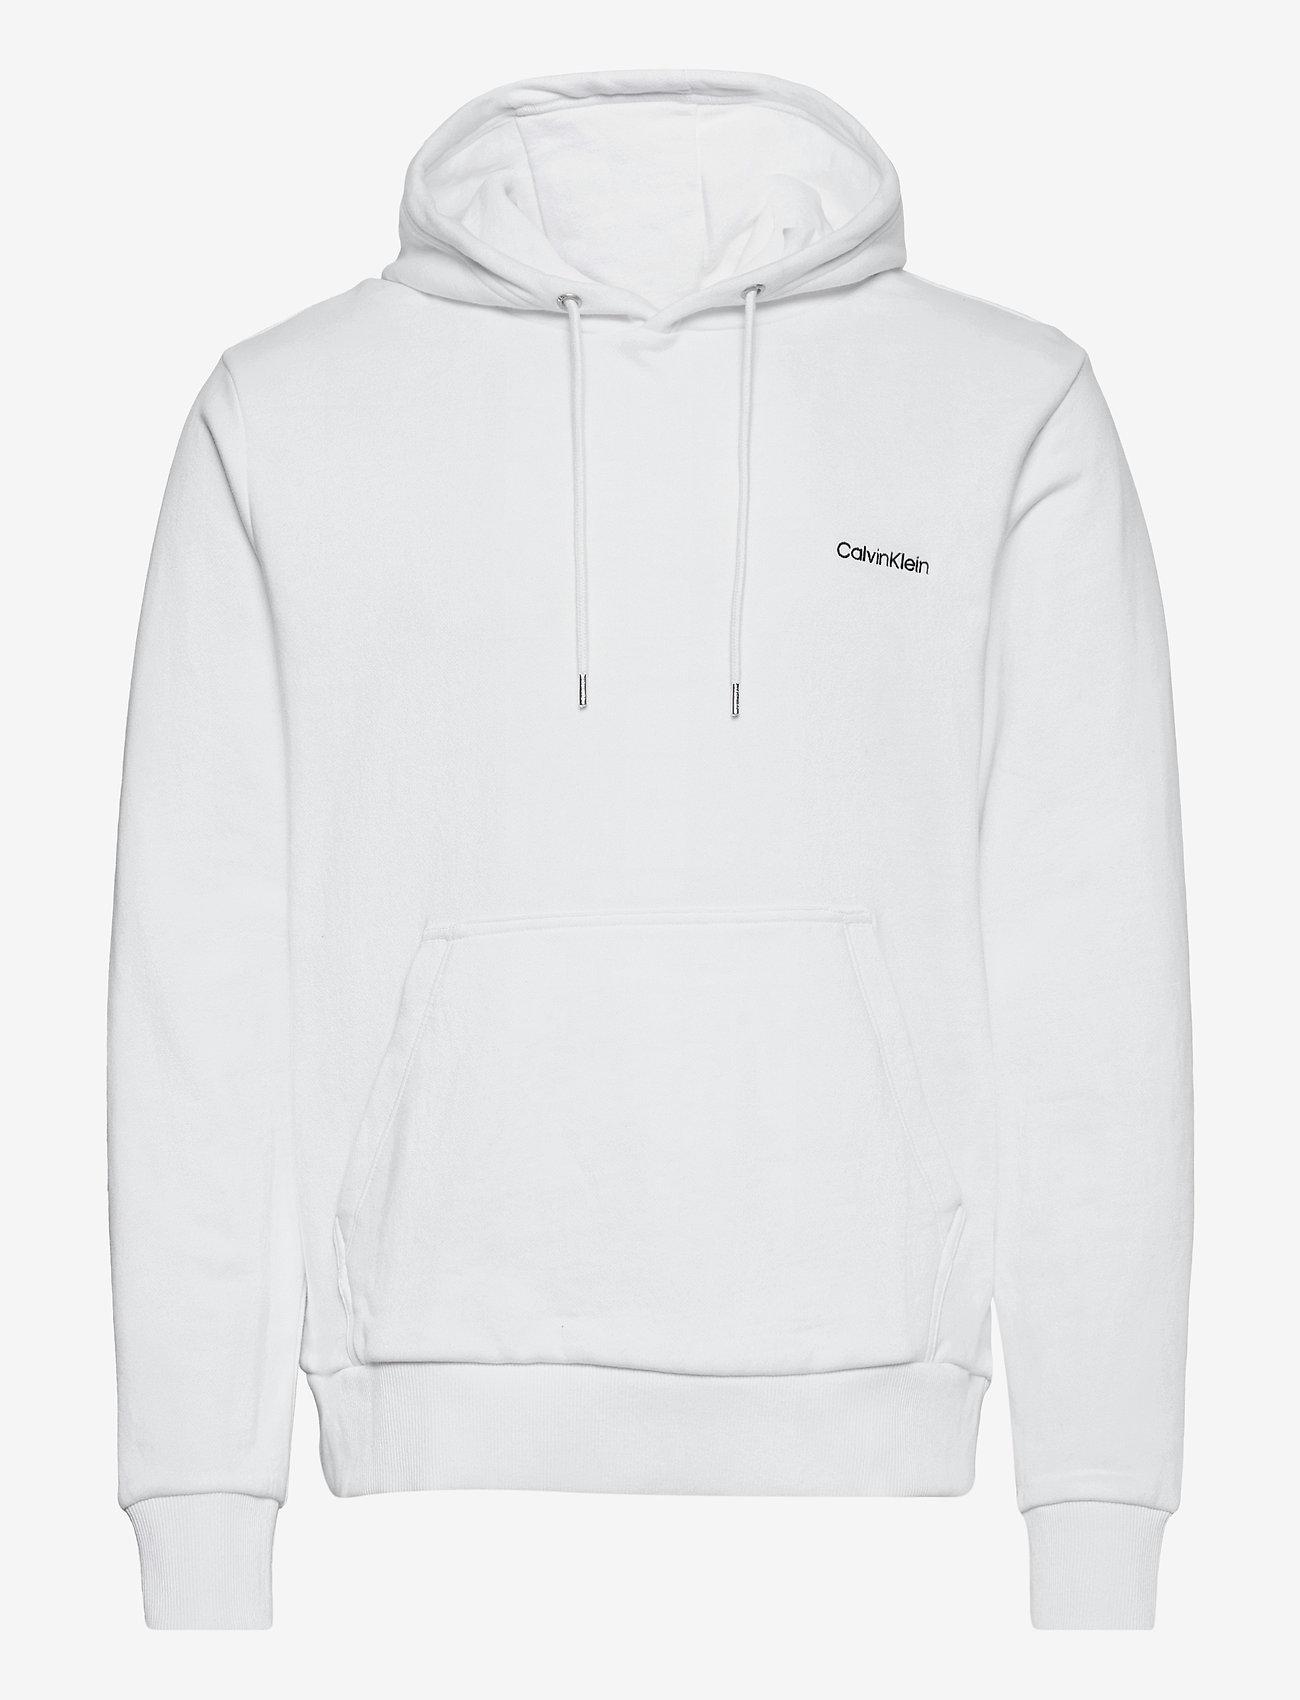 Calvin Klein - LOGO EMBROIDERY HOODIE - hoodies - bright white - 0